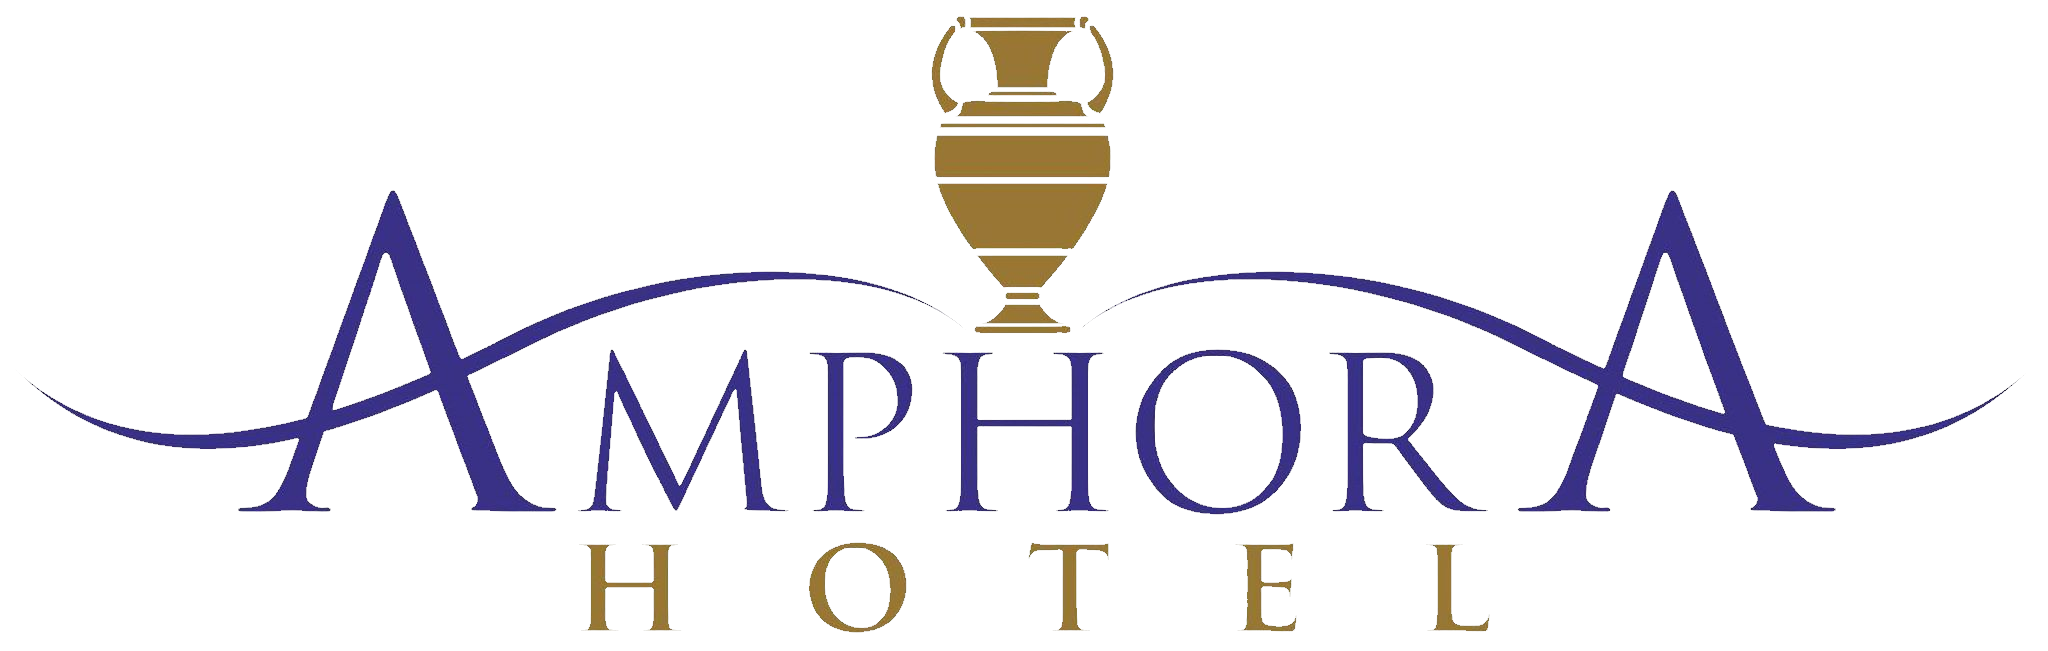 Amphora Hotel | Kaş | Antalya | Amphora Otel